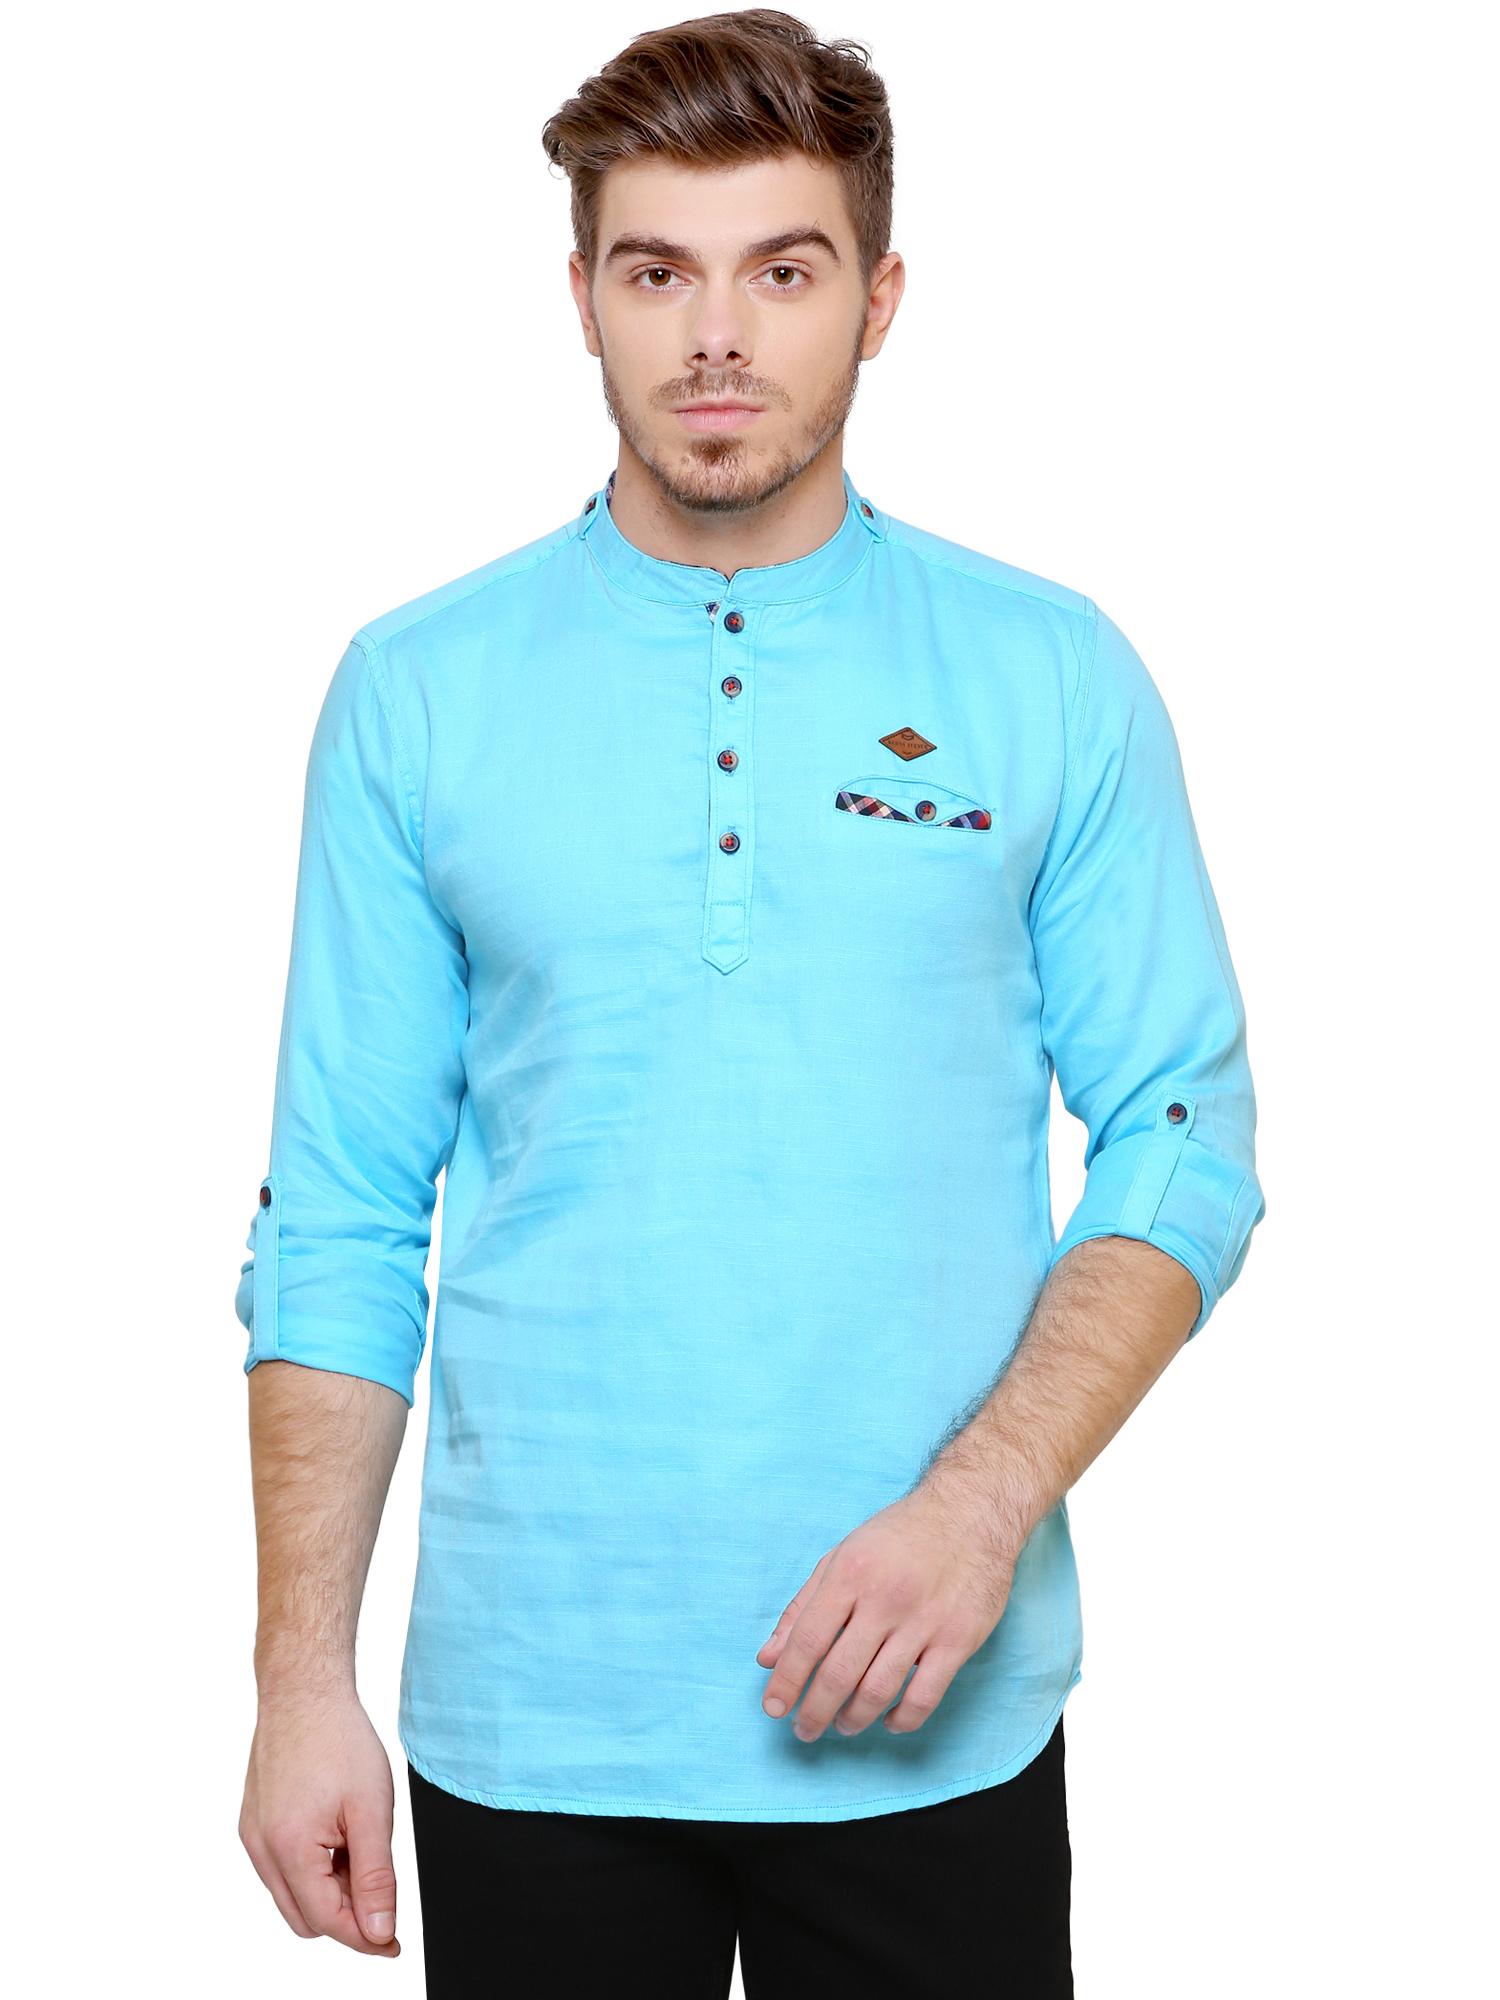 Kuons Avenue | Kuons Avenue Men's Turquoise Blue Casual Cotton Kurta- KACLFS1261TQ